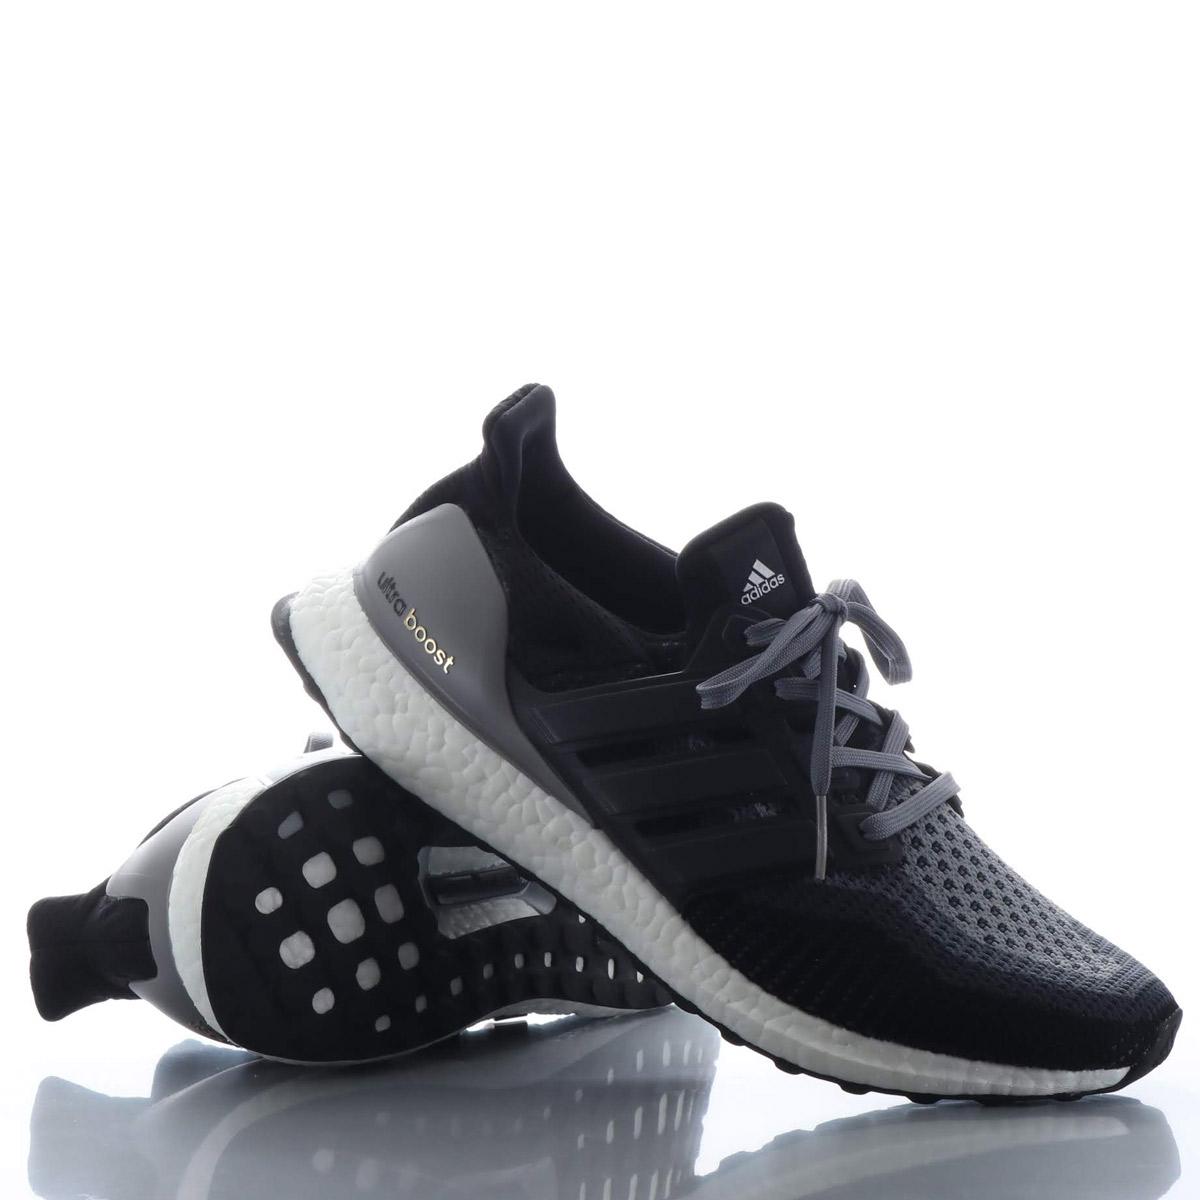 0c53bd2b80d adidas UltraBOOST (Adidas ultra boost) CORE BLACK CORE BLACK GREY 18FW-I